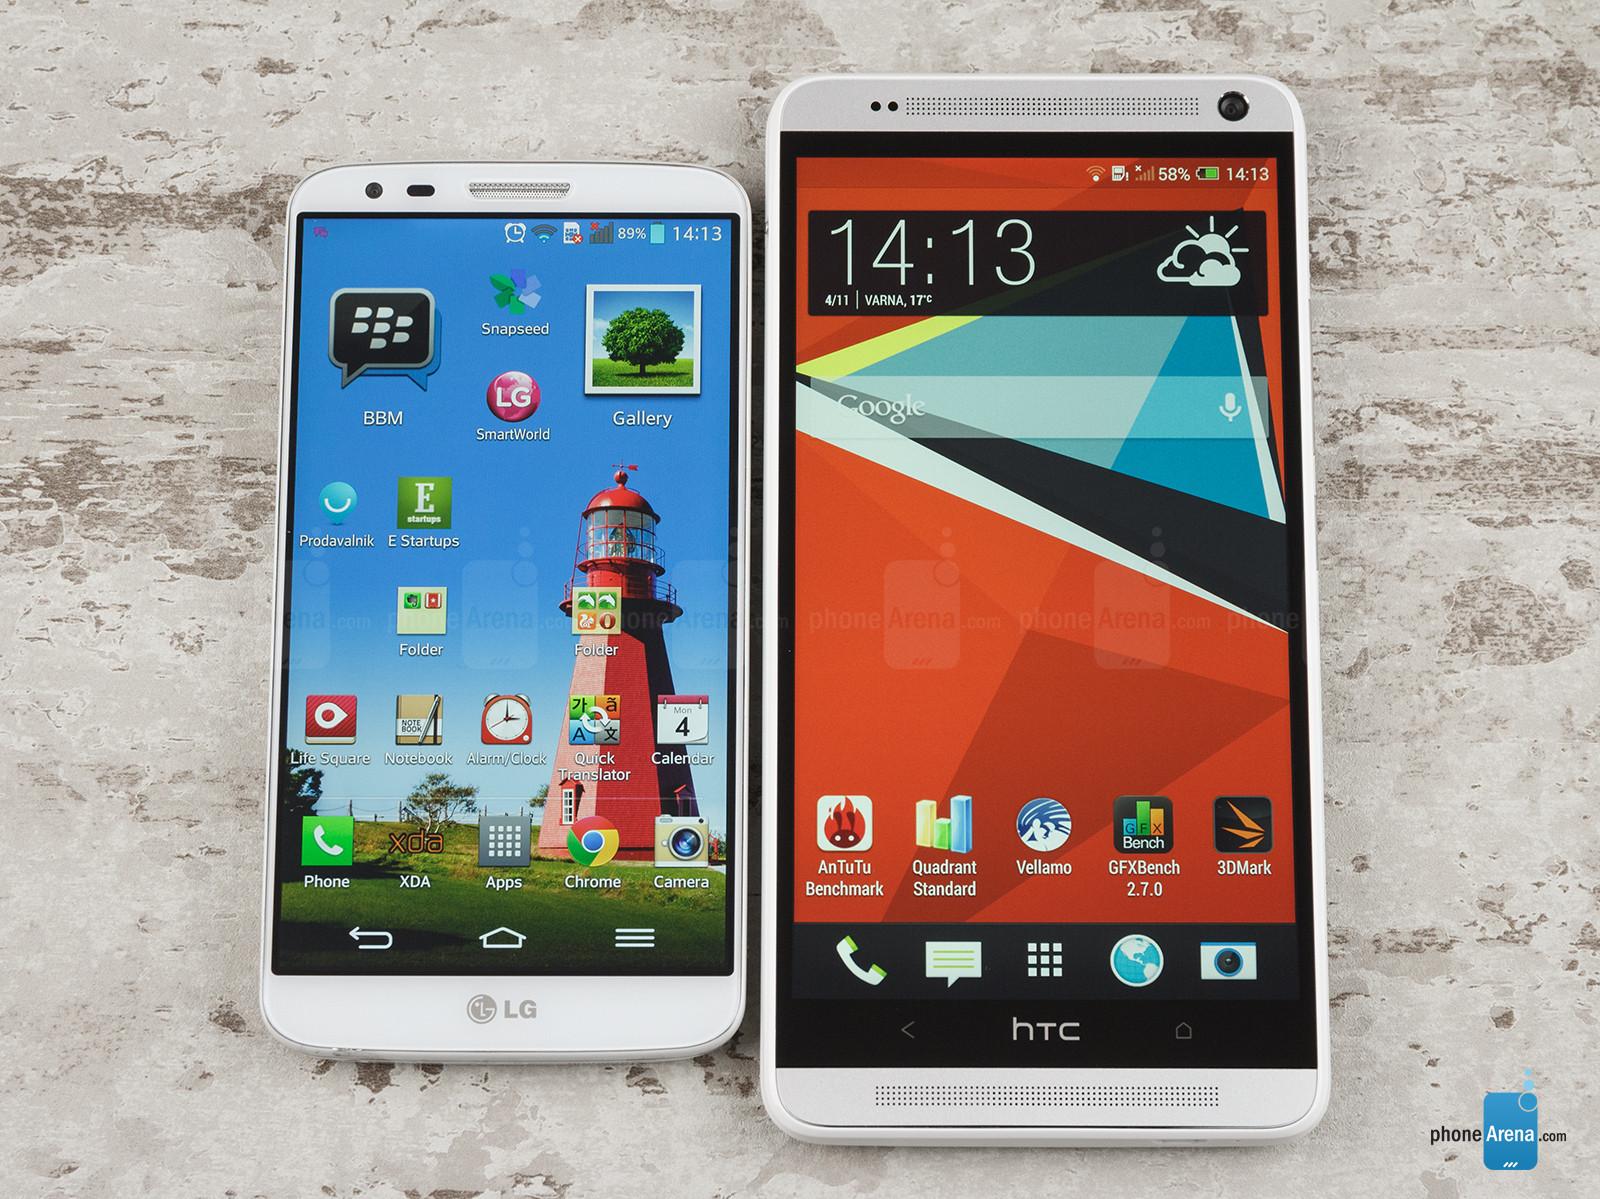 HTC-One-max-vs-LG-G2-001